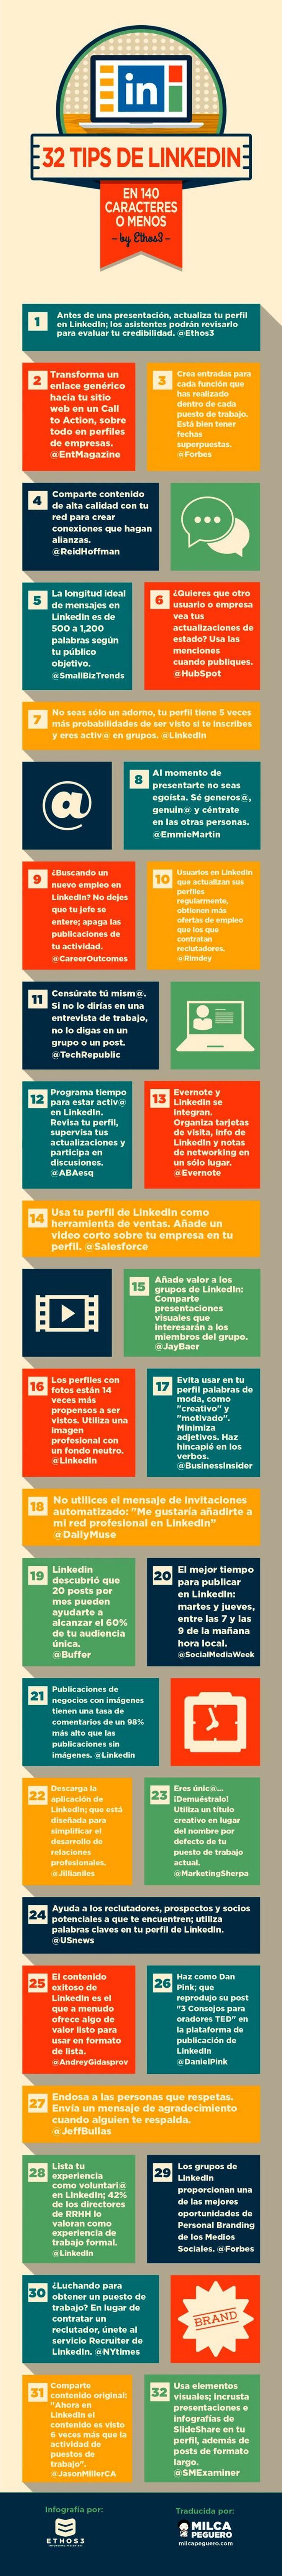 #Infografía con 32 #Tips para tener un buen perfil de #LinkedIn.